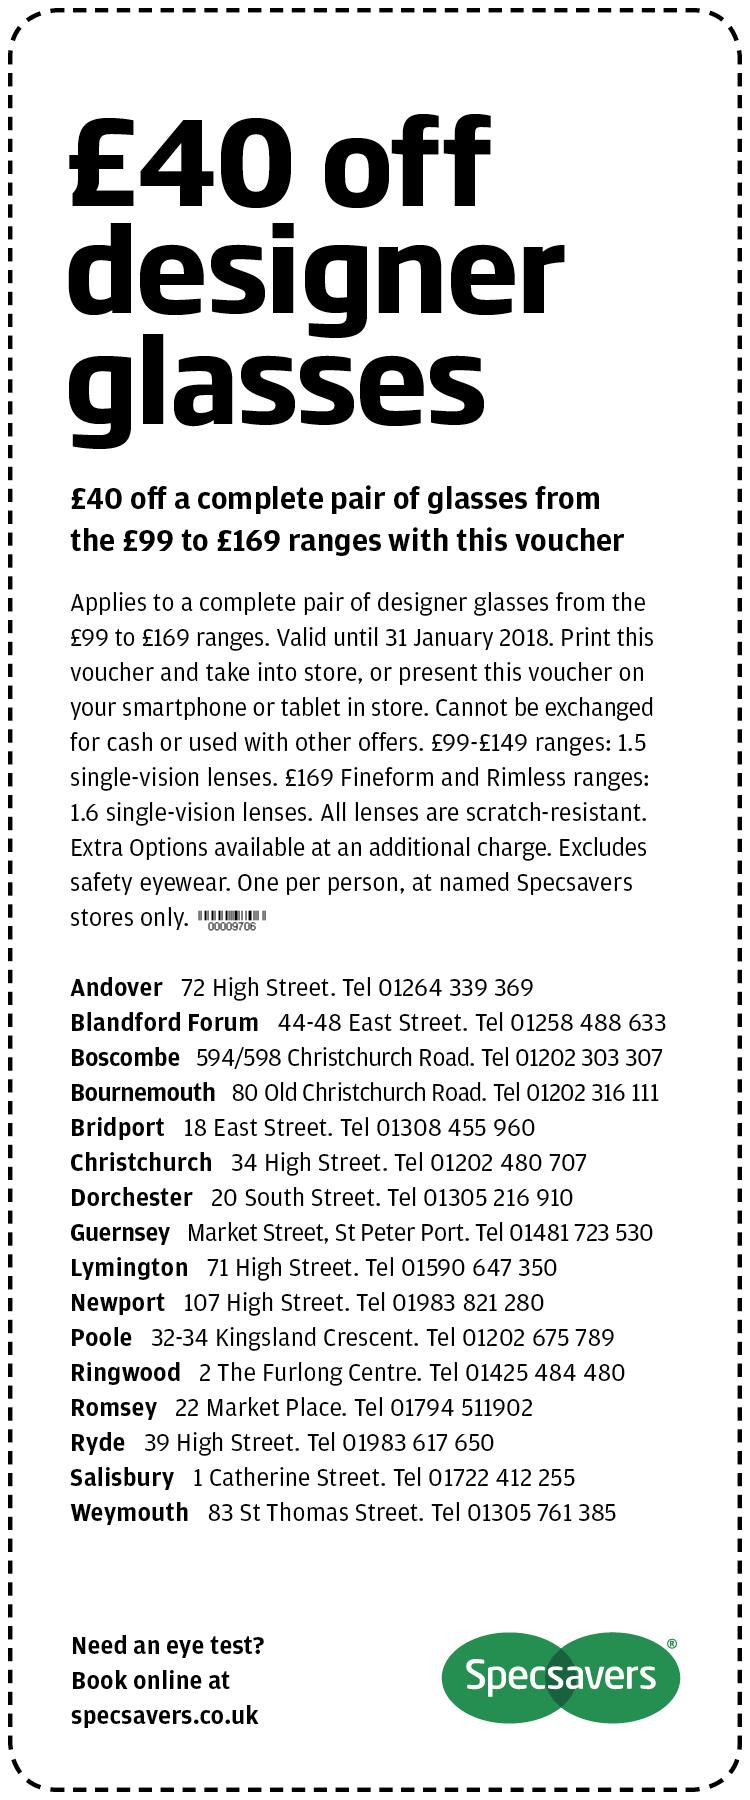 £40 off designer glasses - Hampshire West